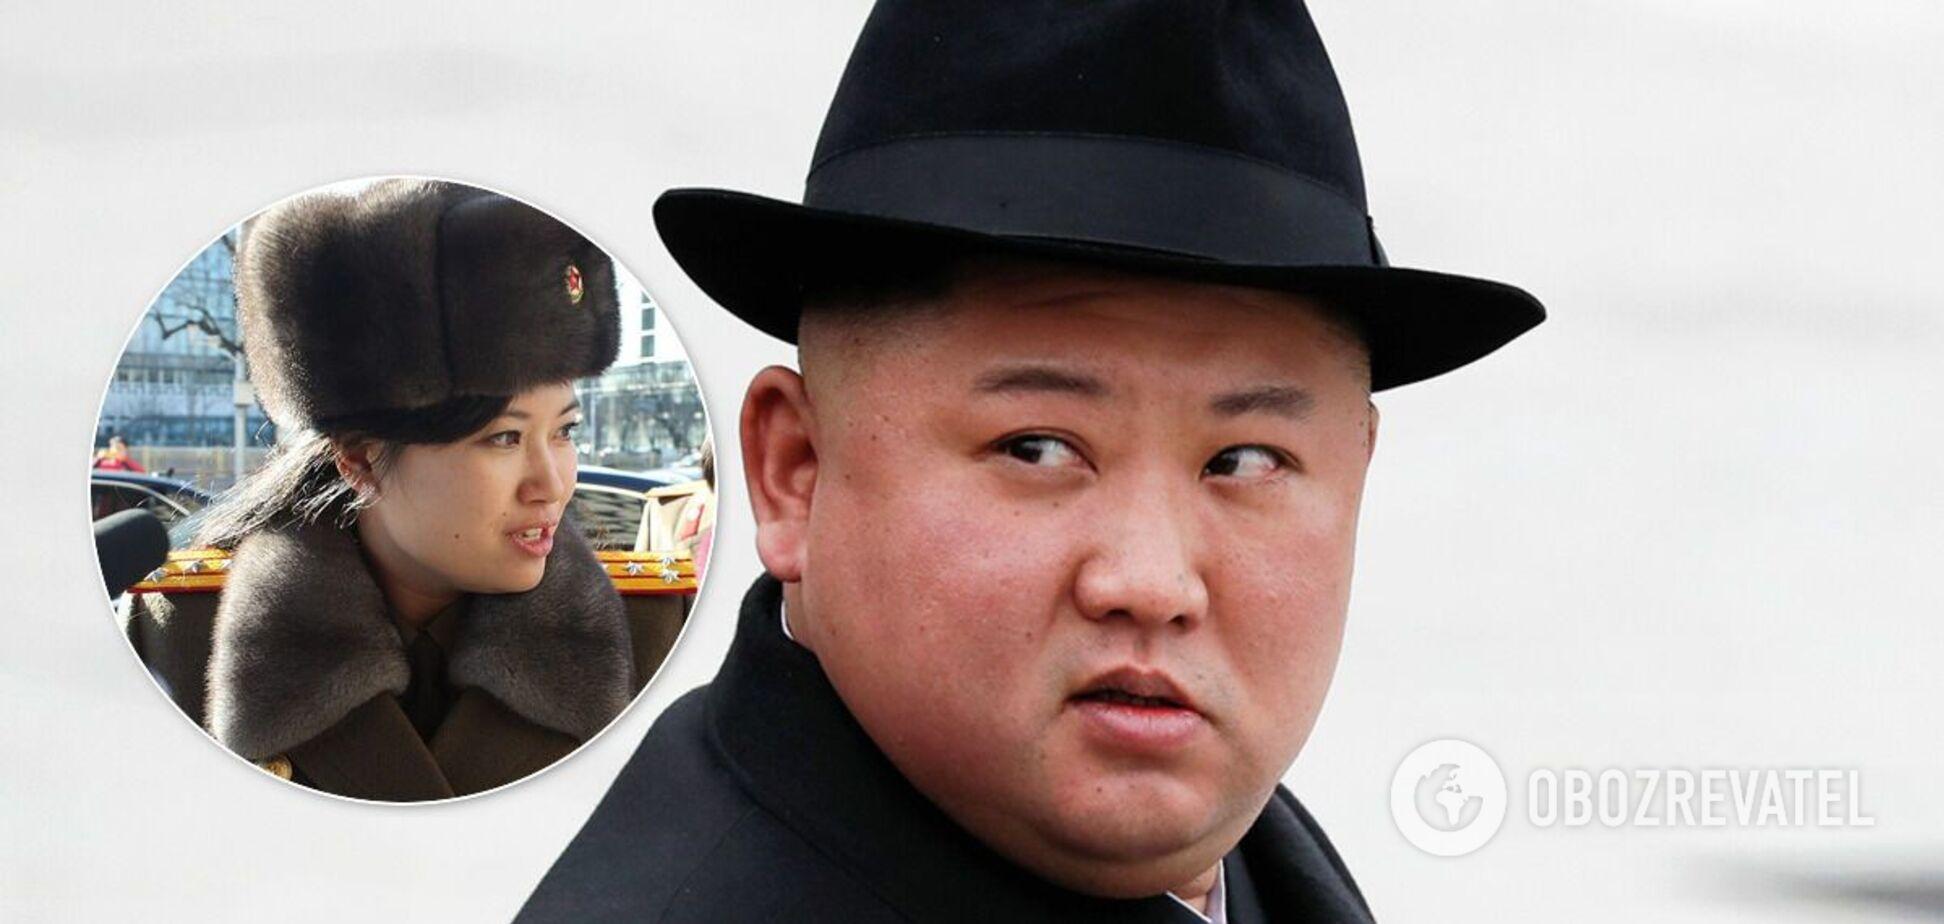 Хьон Сон Воль и Кім Чен Ин